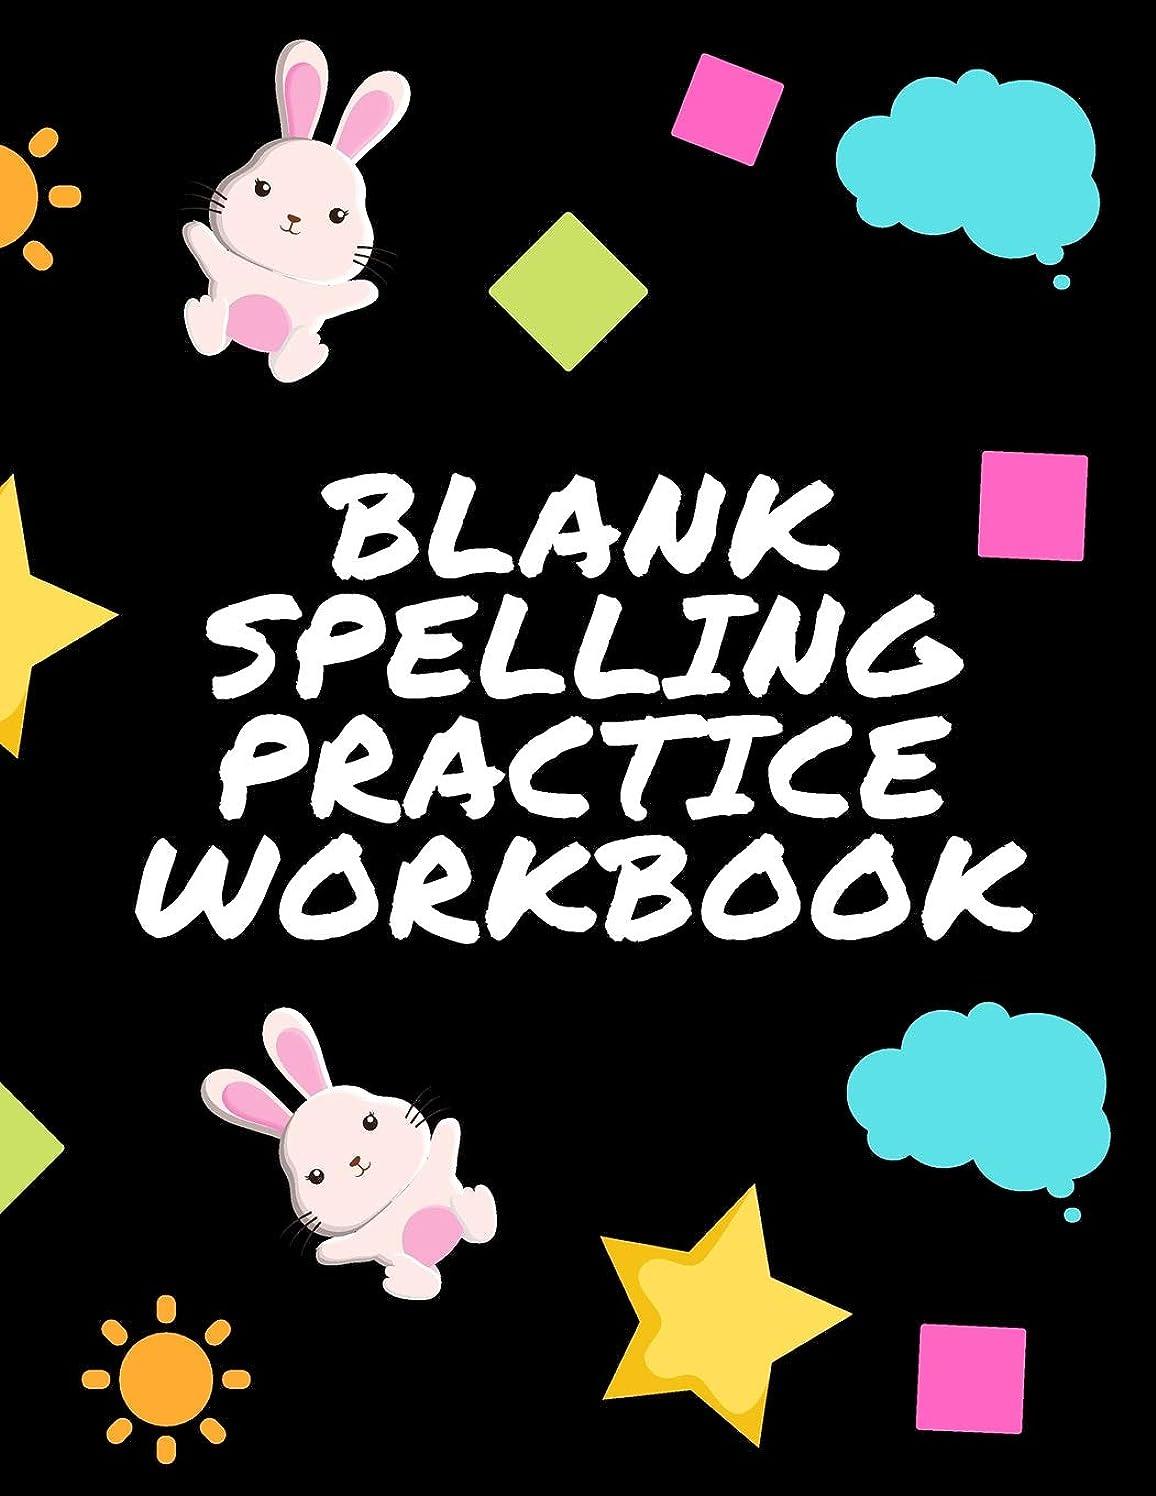 Blank Spelling Practice Workbook: Practice Spelling Notebook for Kids in All Grade Levels (Volume 7)